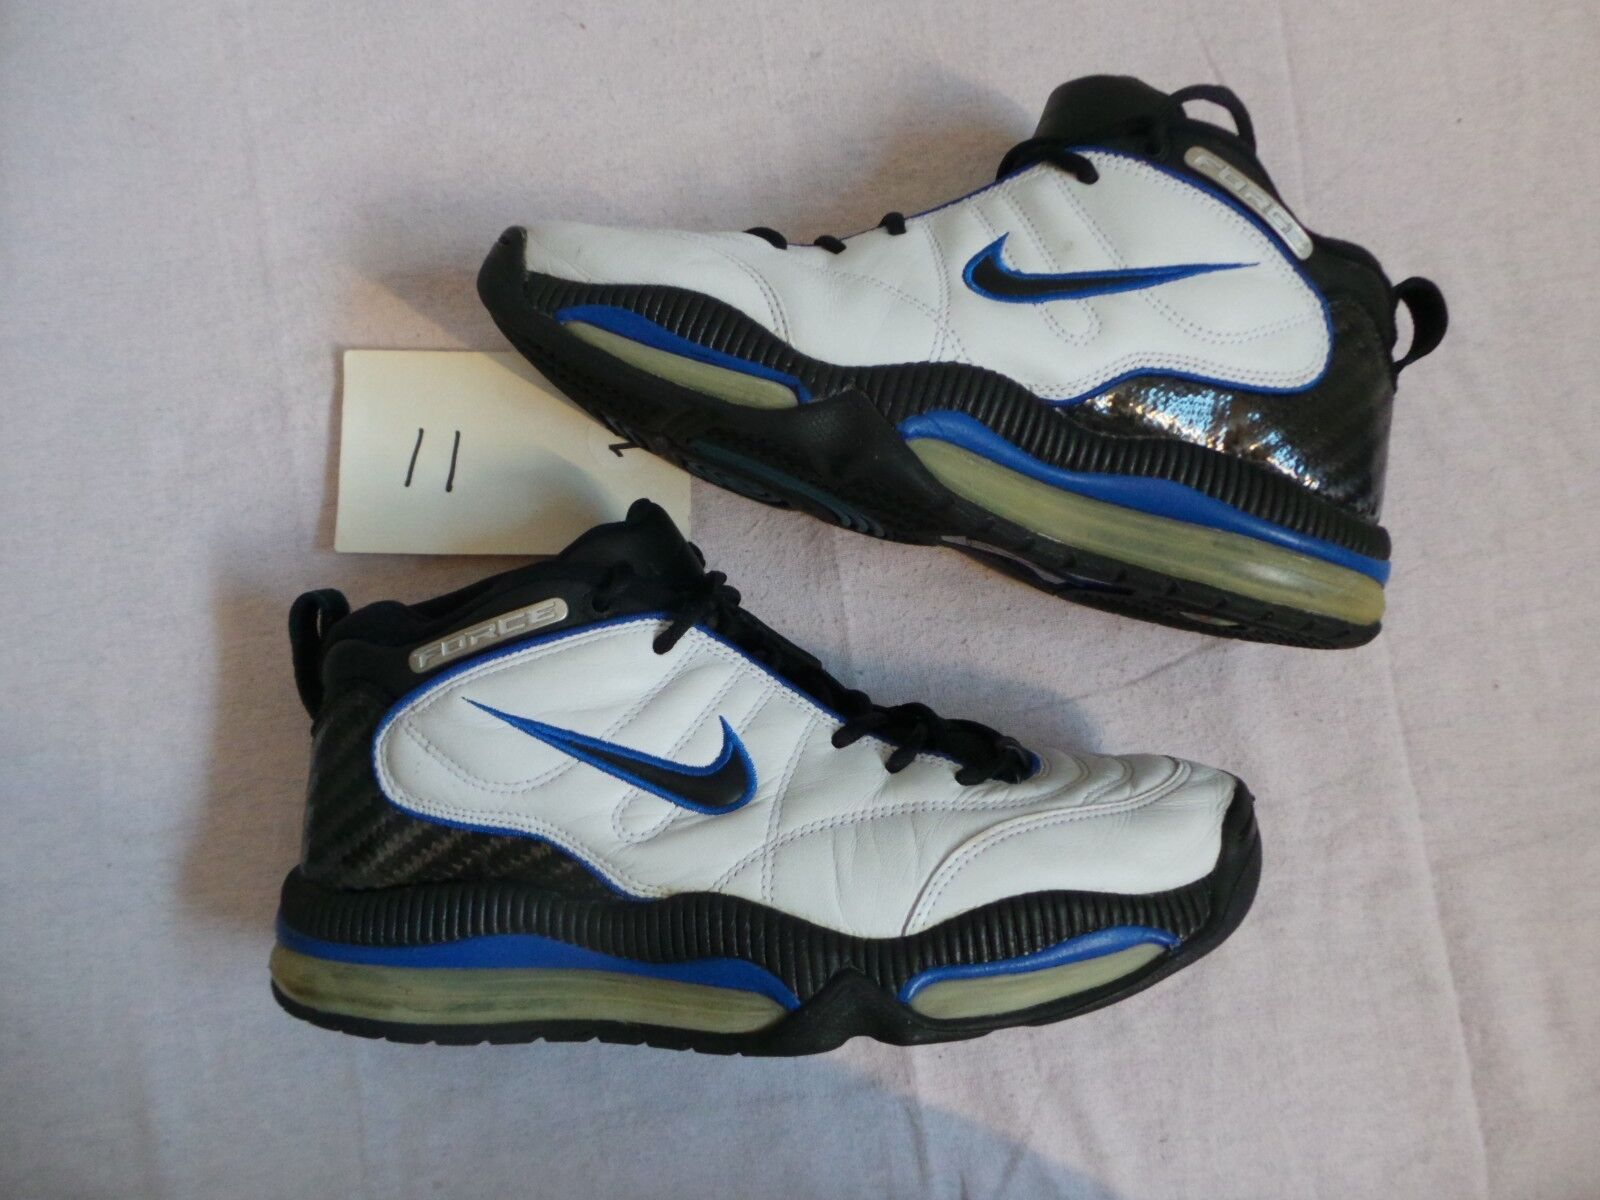 Nike Air Total Aggress Force 90s s 11 OG Vintage 90s Force Original black royal white RARE 0b1107